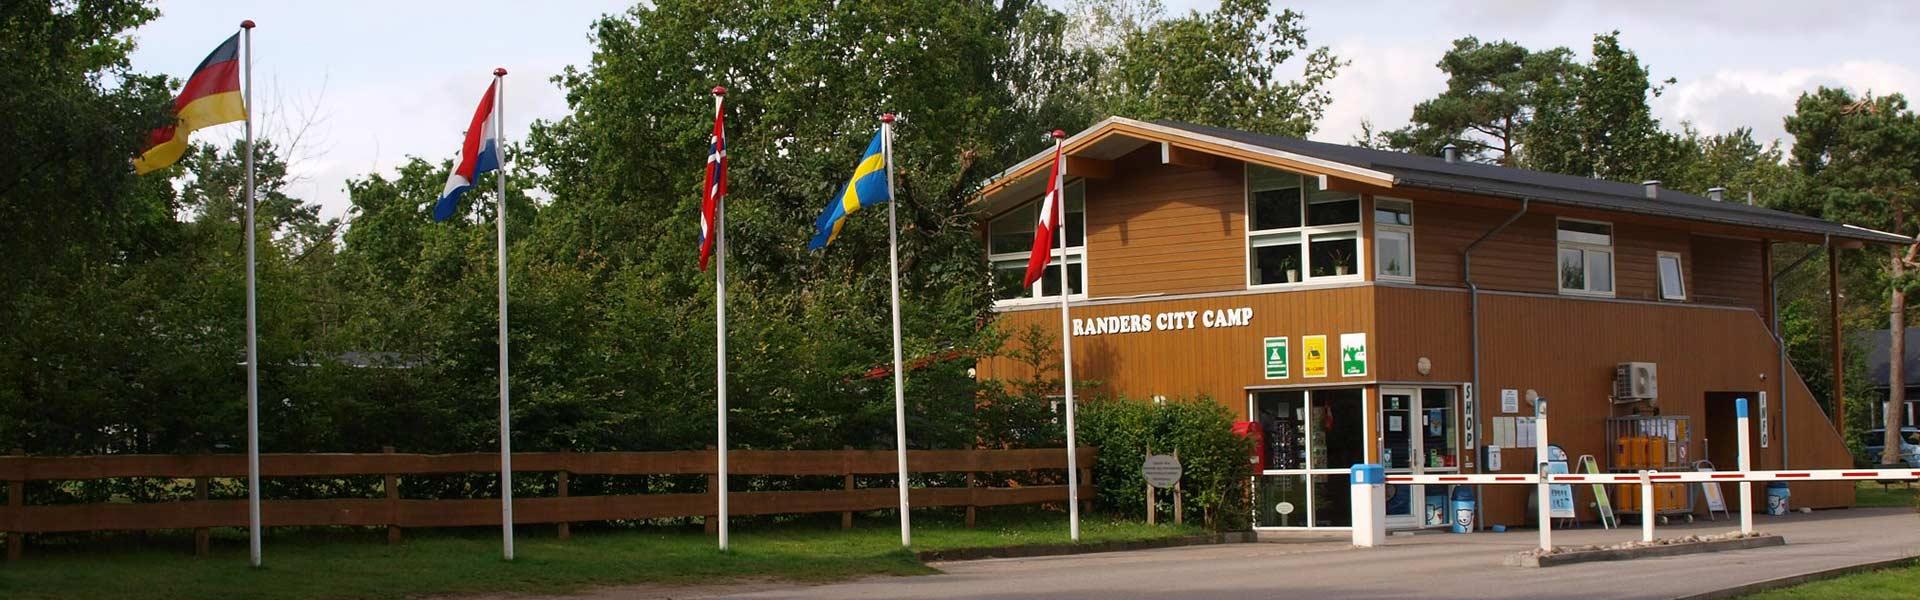 Randers City Camp